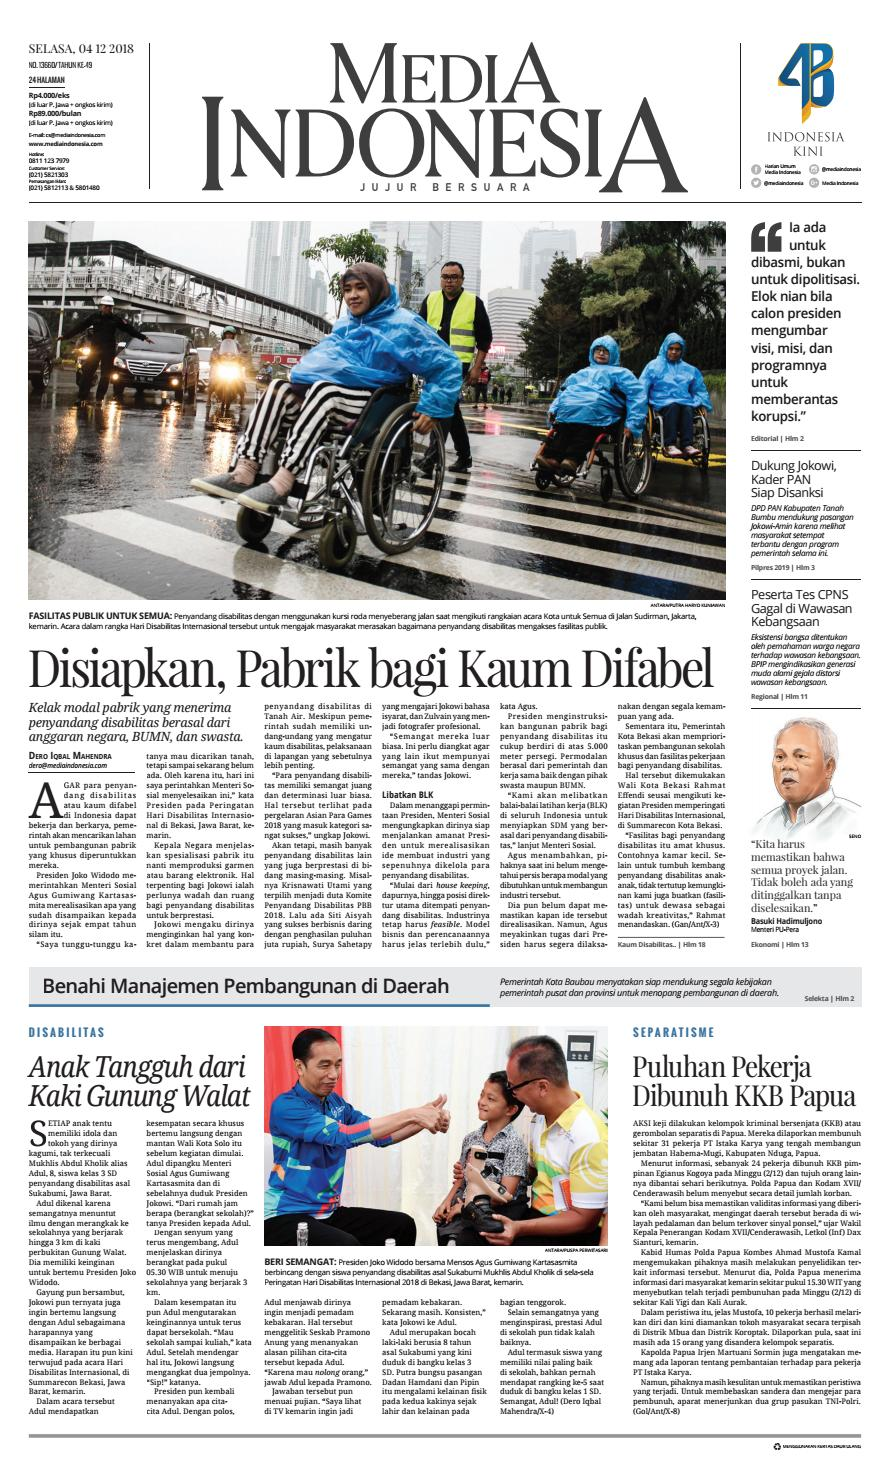 Media Indonesia 4 Desember 2018 By Mediaindonesia Issuu